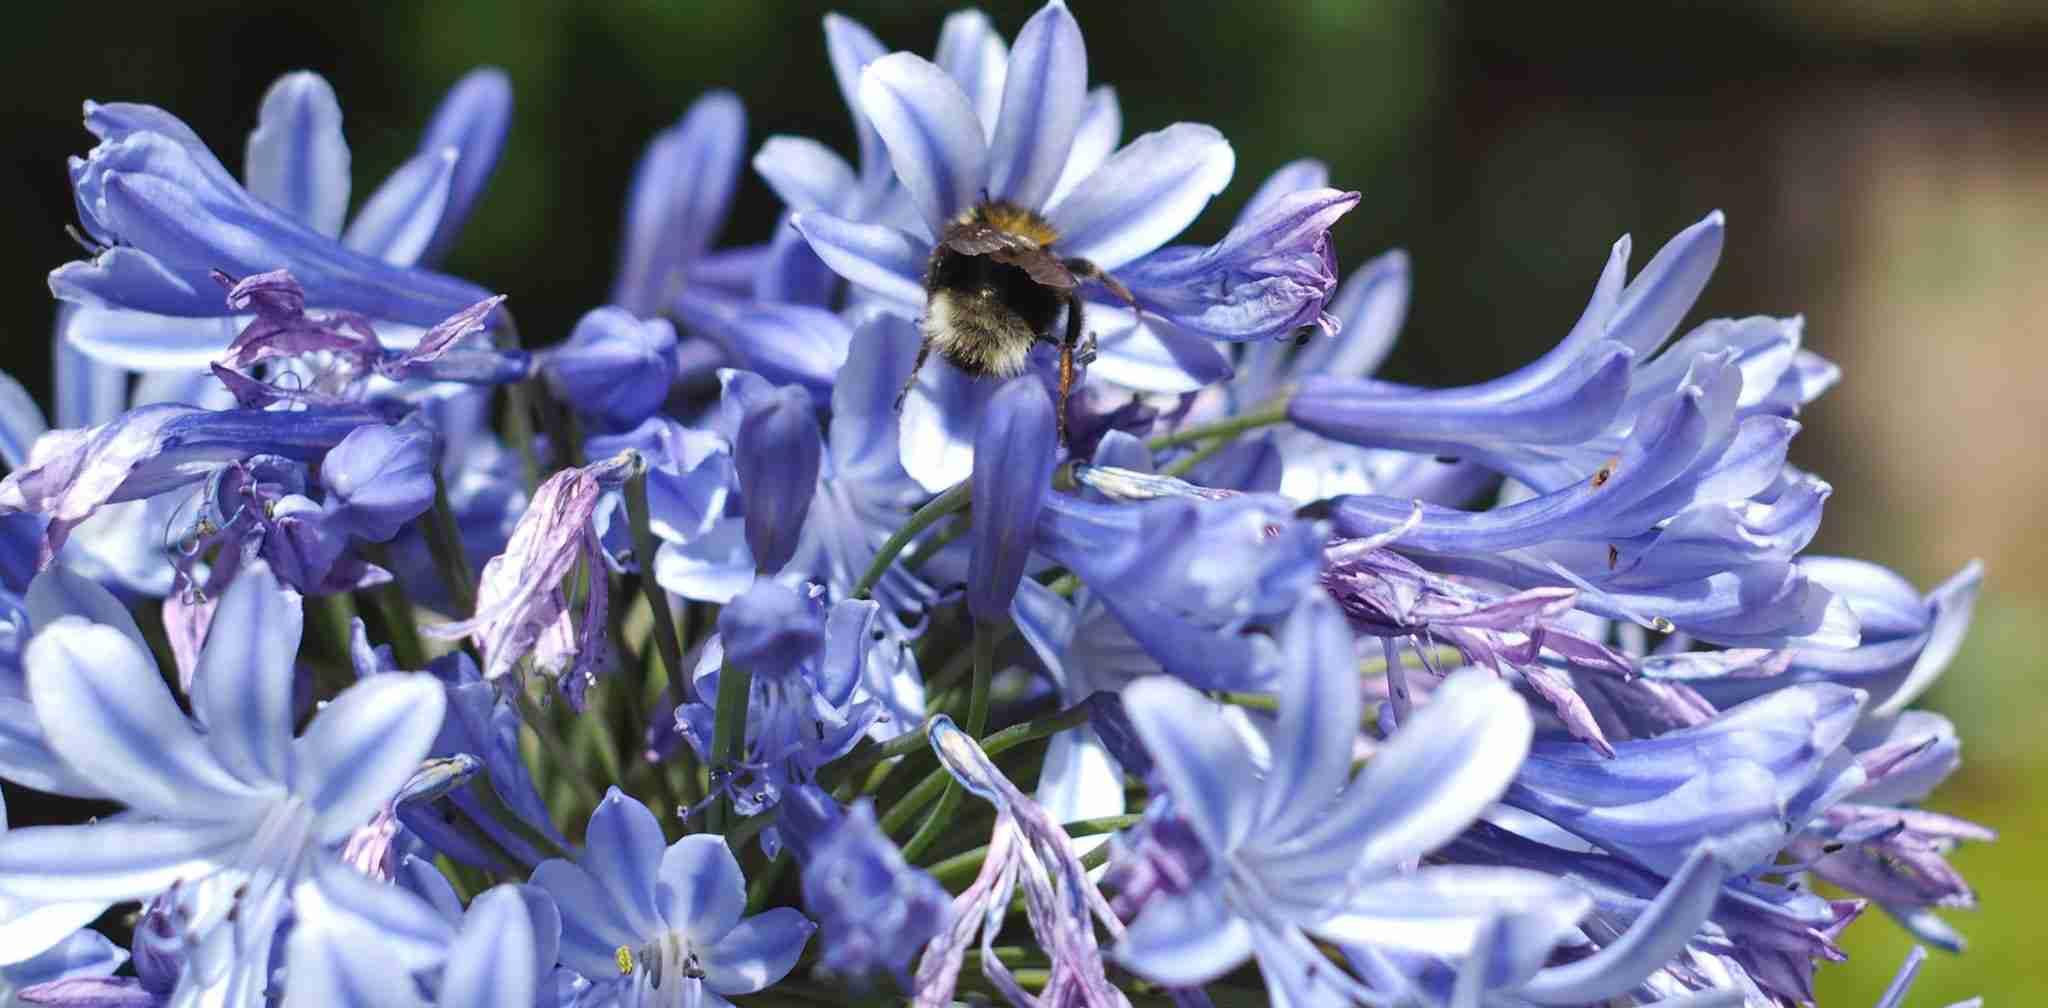 Beeston Bees